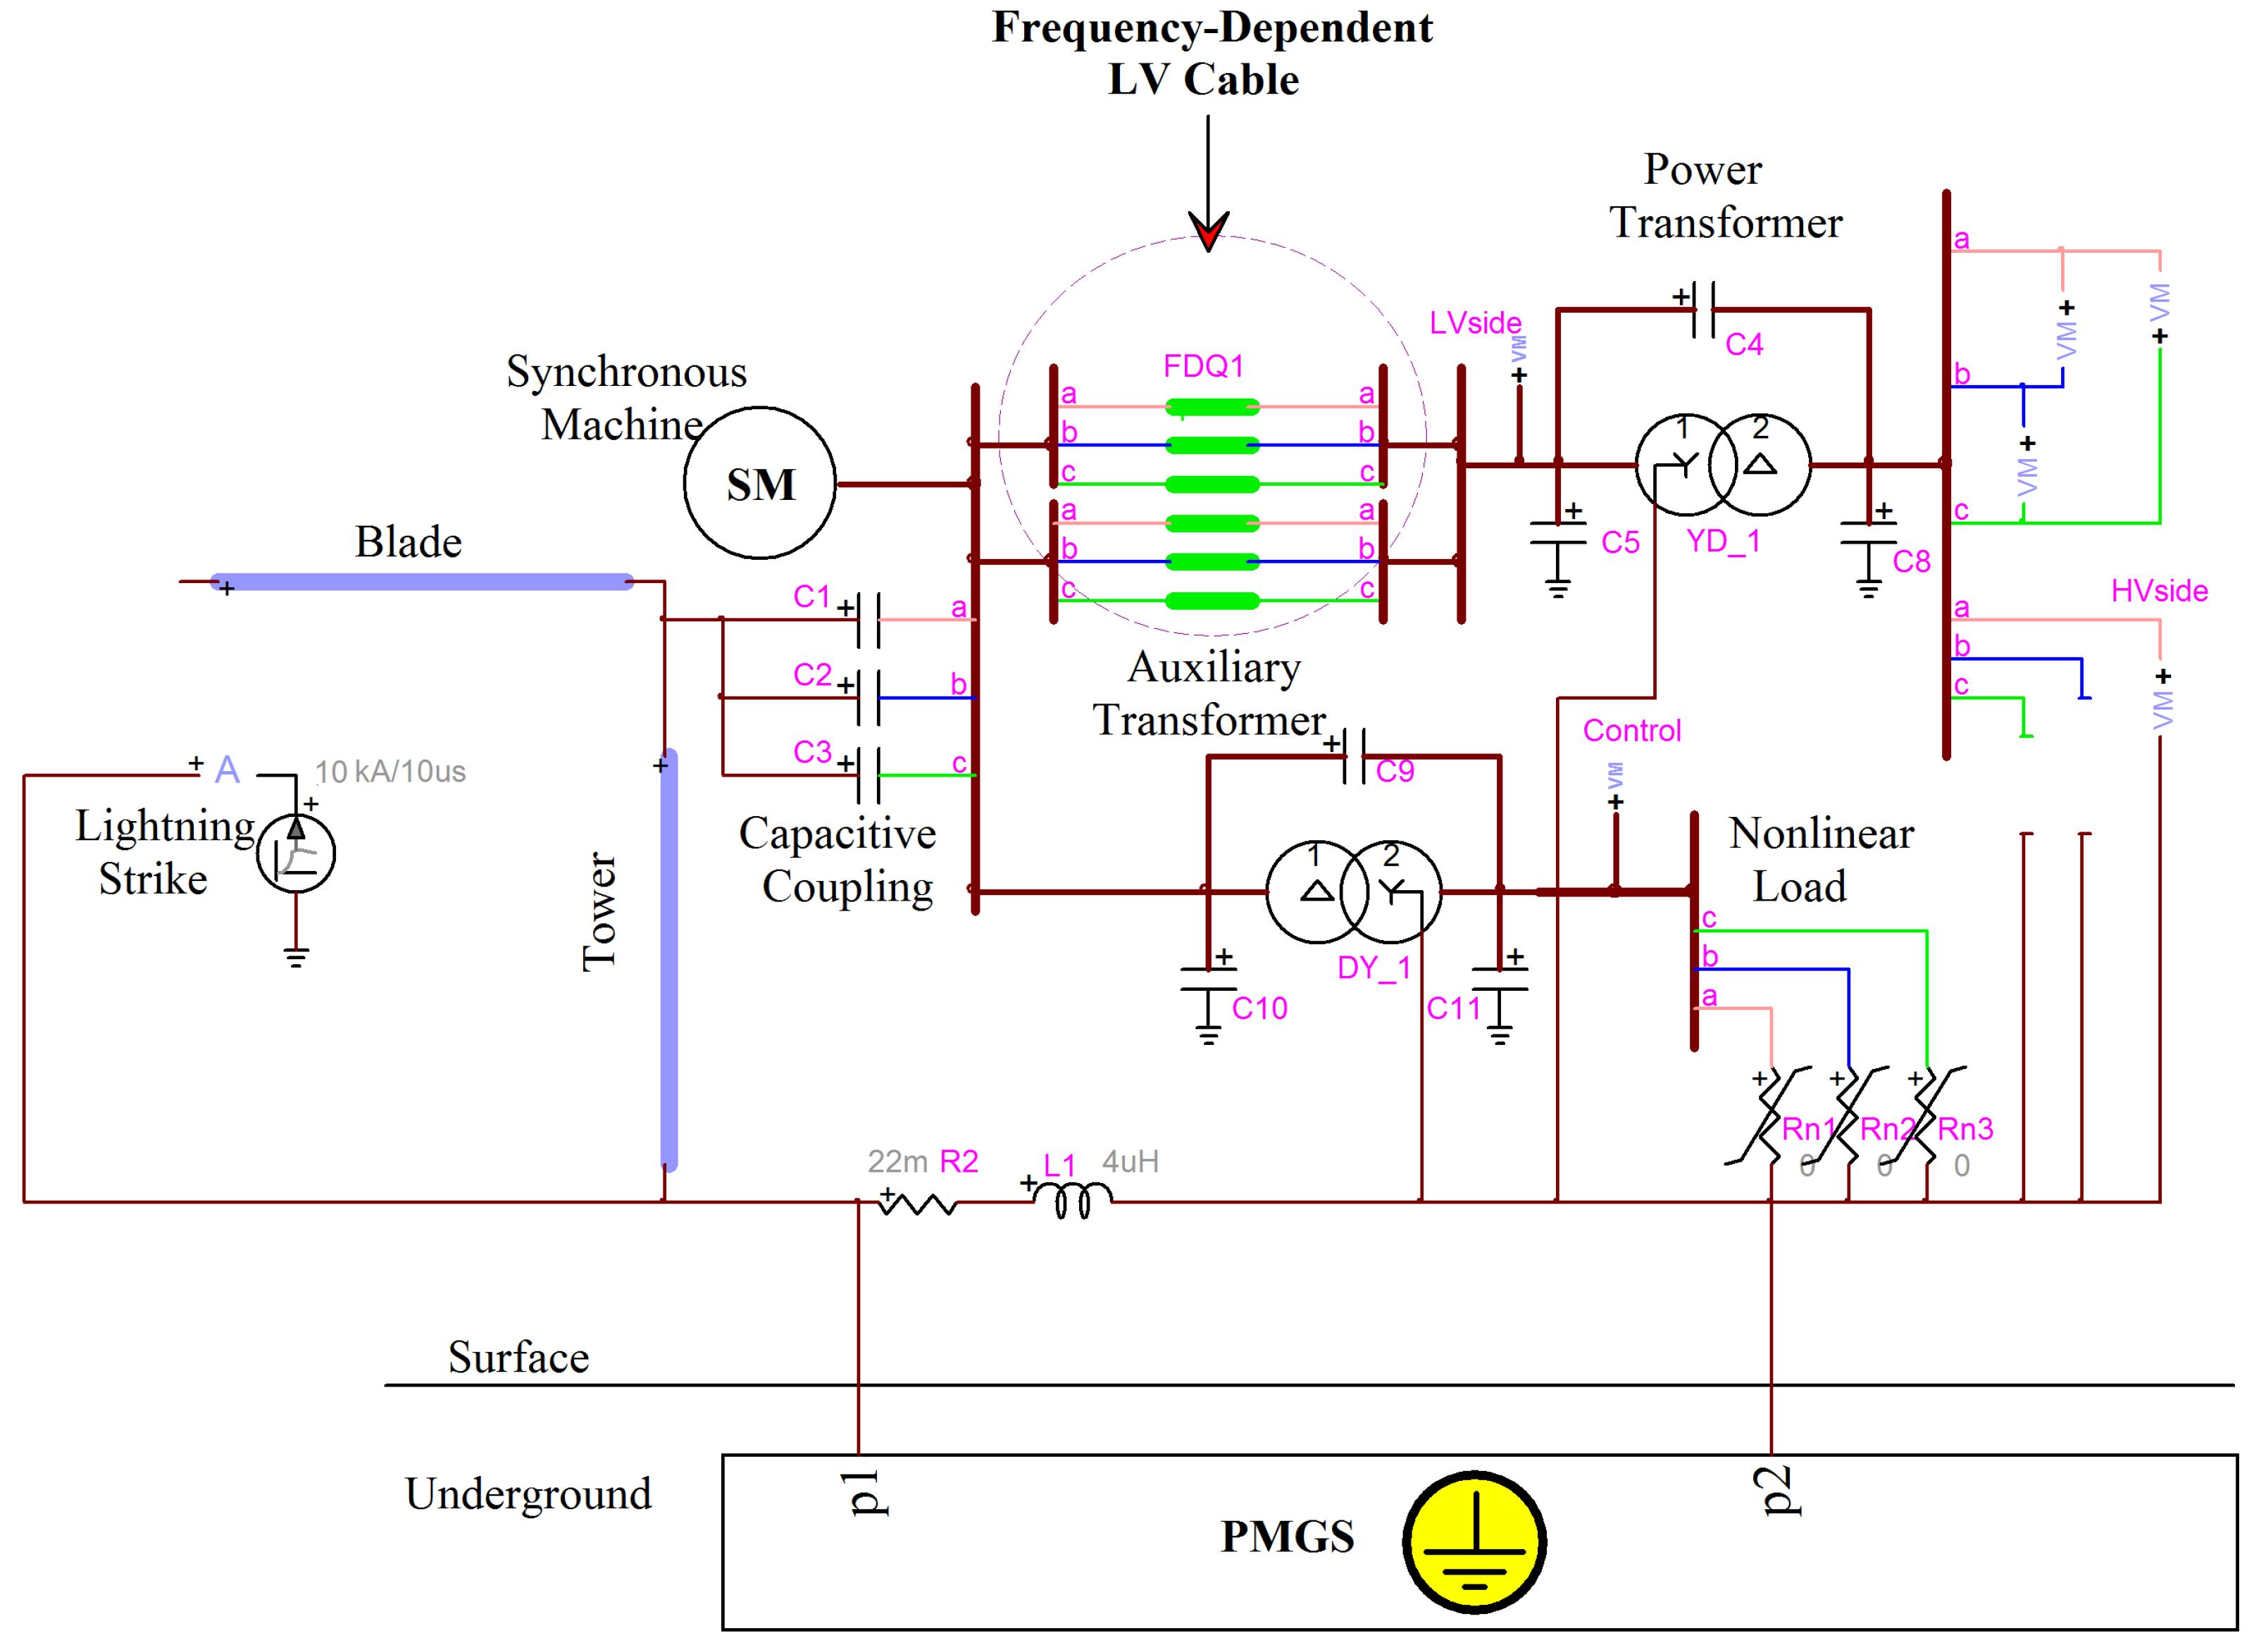 Applied Sciences Free Full Text Evaluating The High Frequency Yokoyama Control Transformer Wiring Diagram Applsci 07 01323 G007